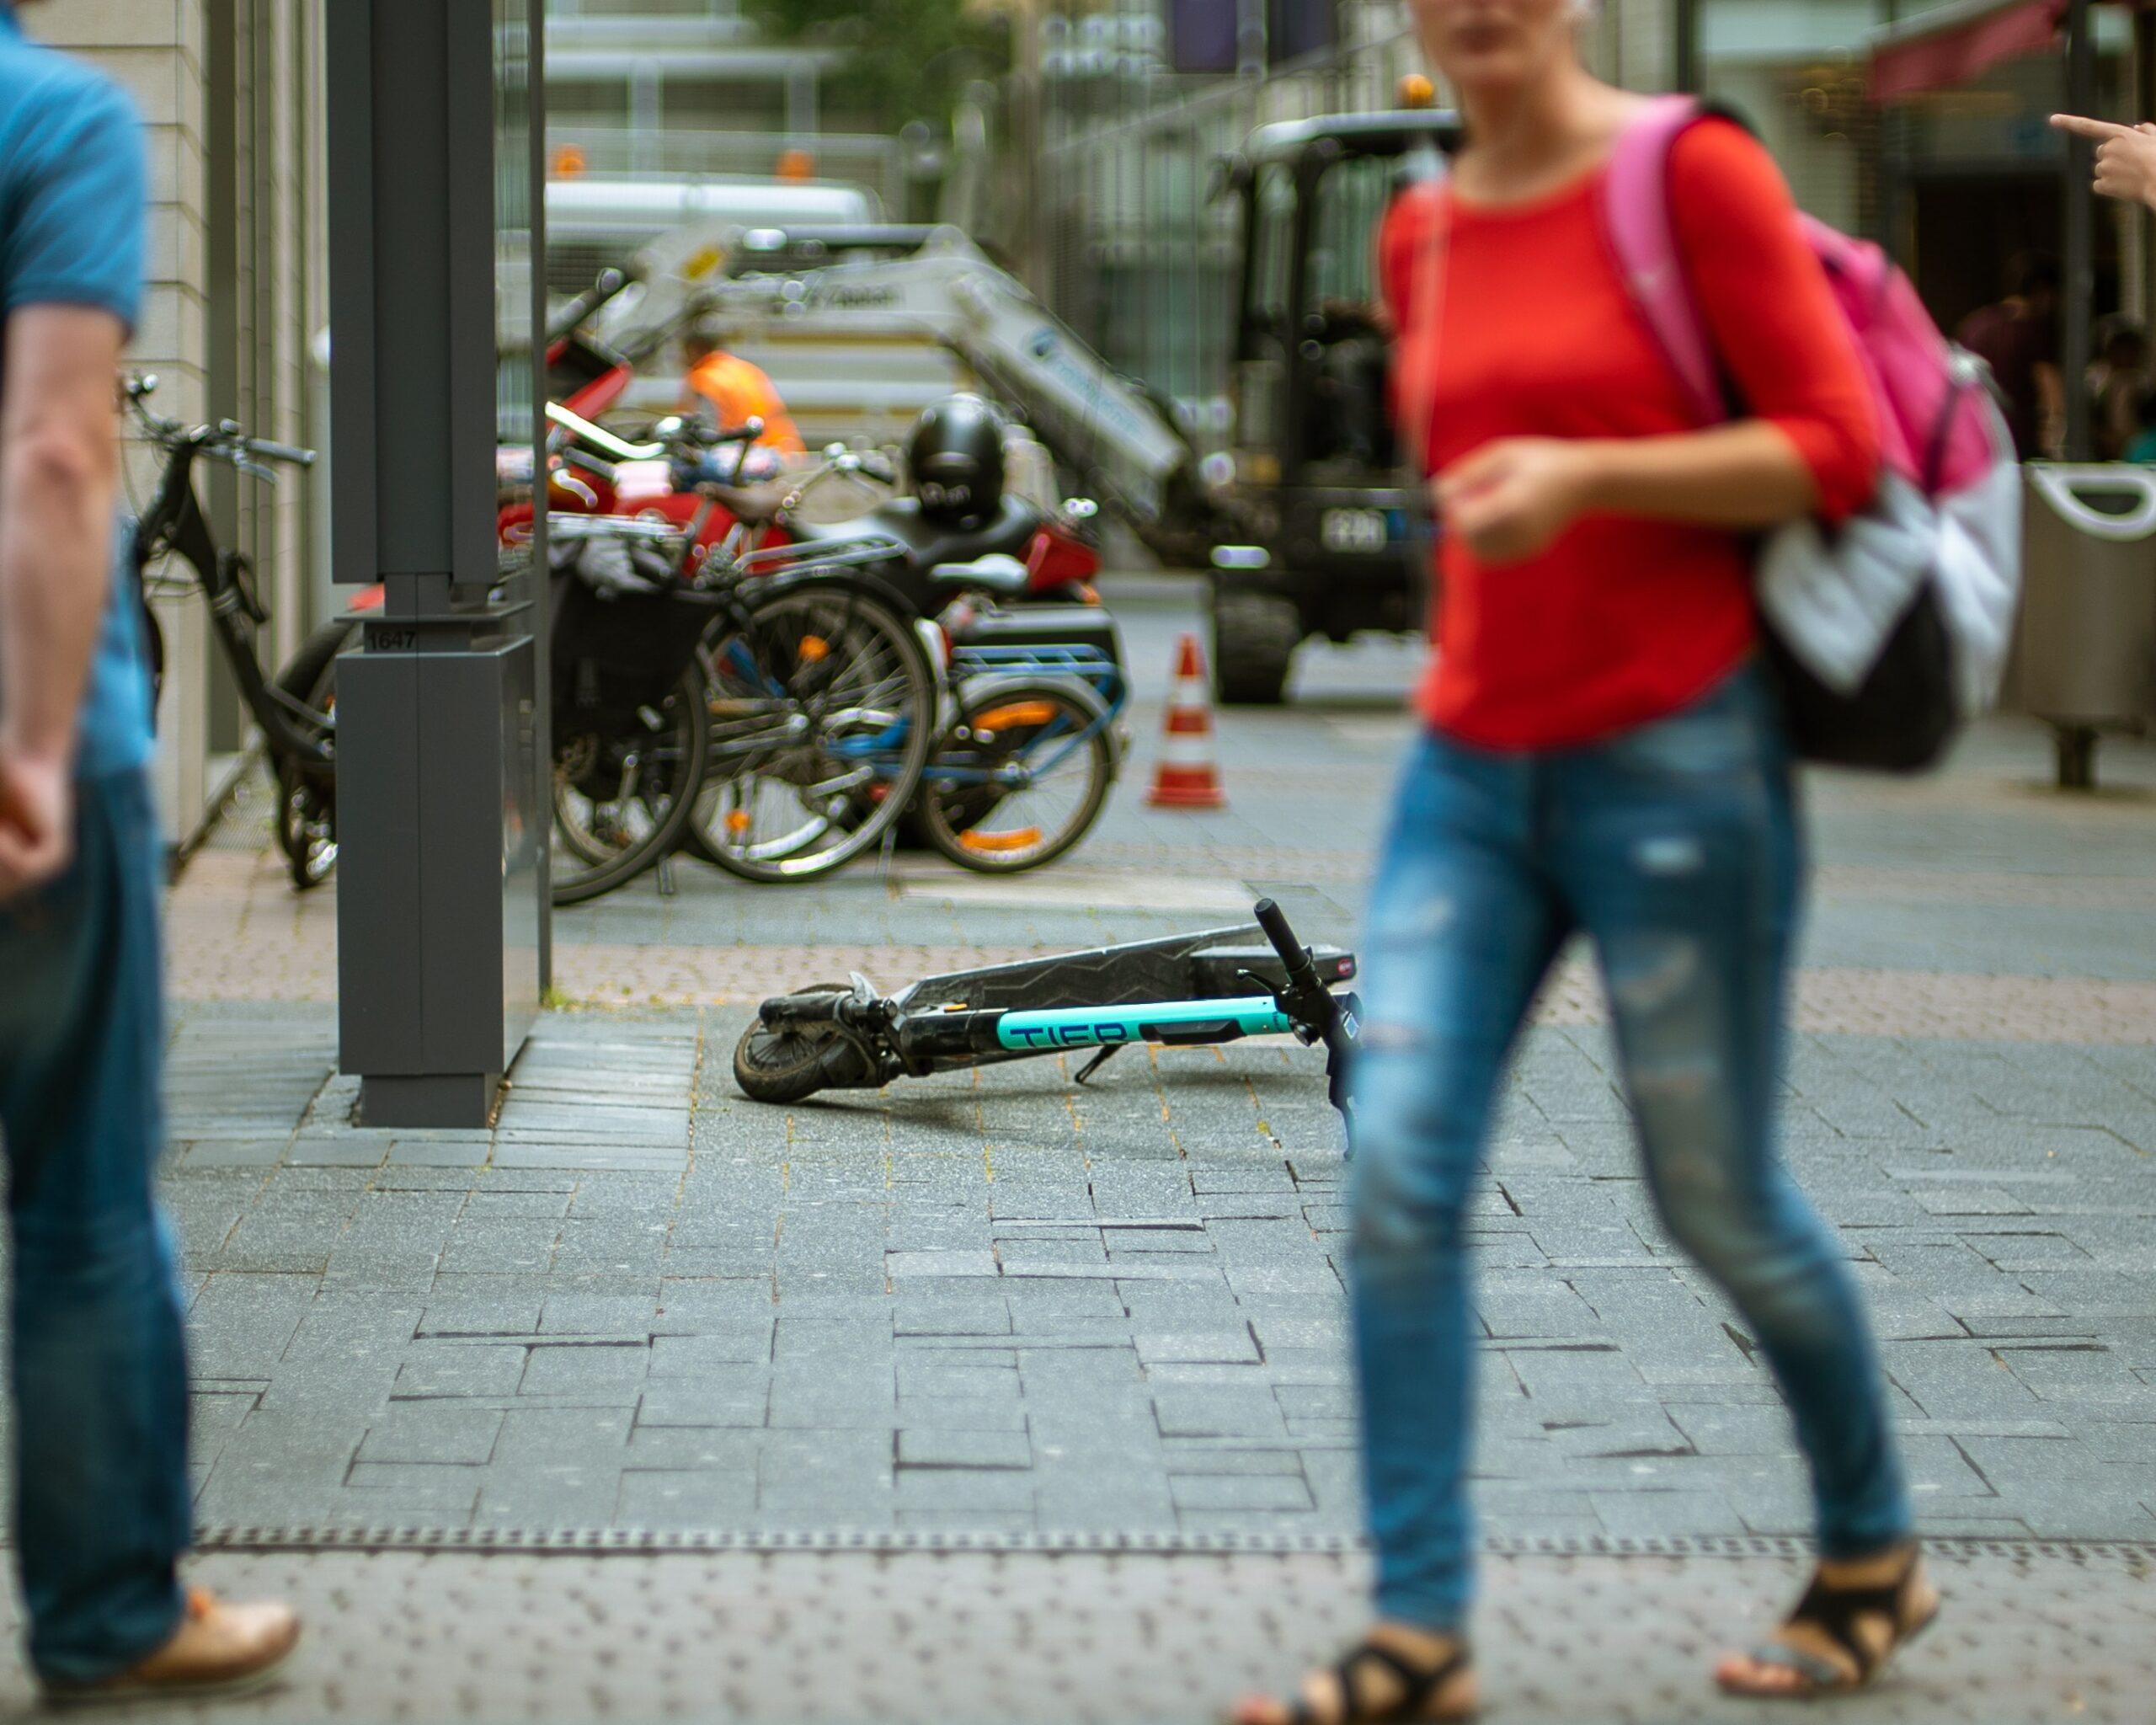 Escooter pavement